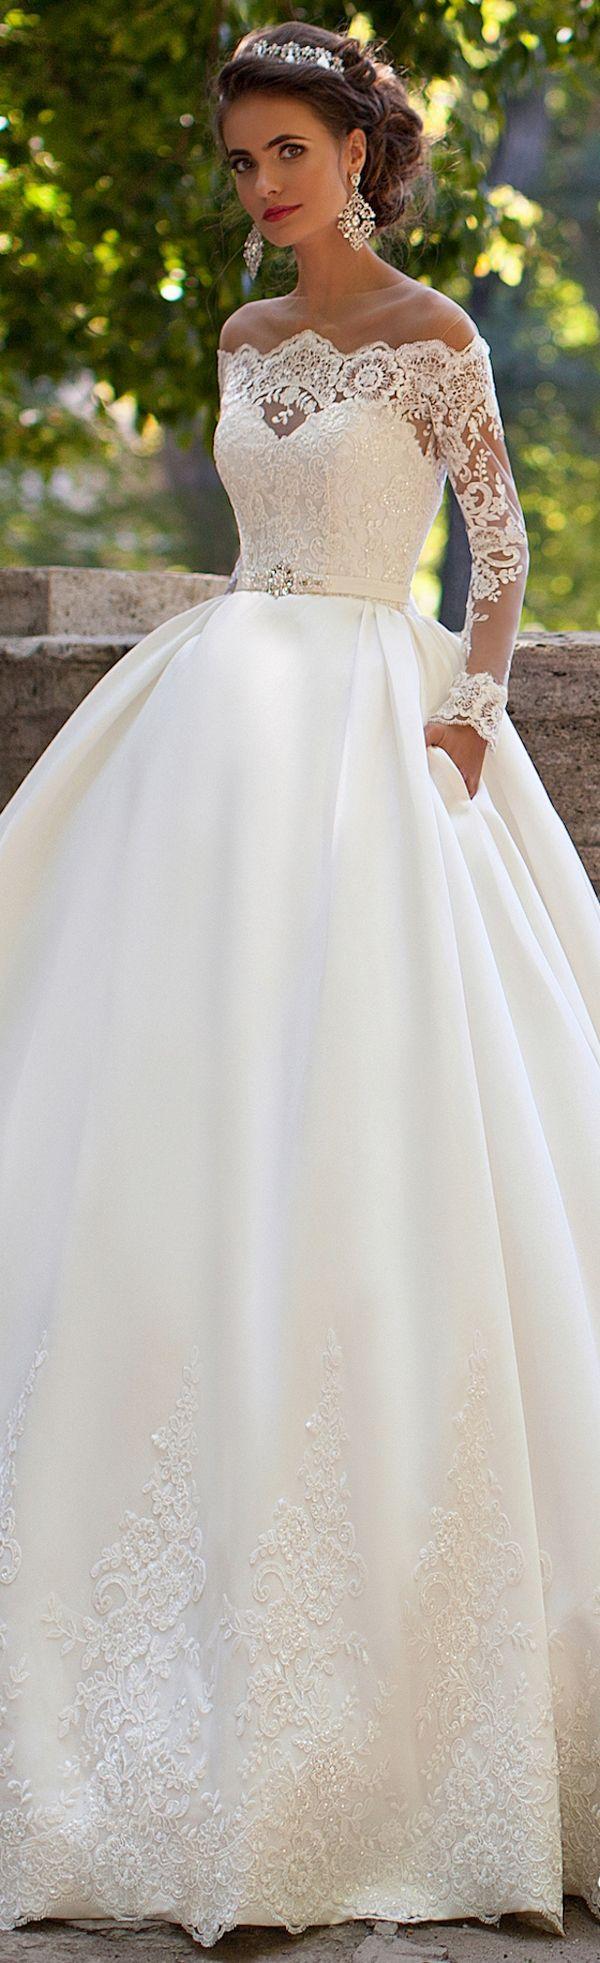 best someday images on pinterest wedding ideas bridal